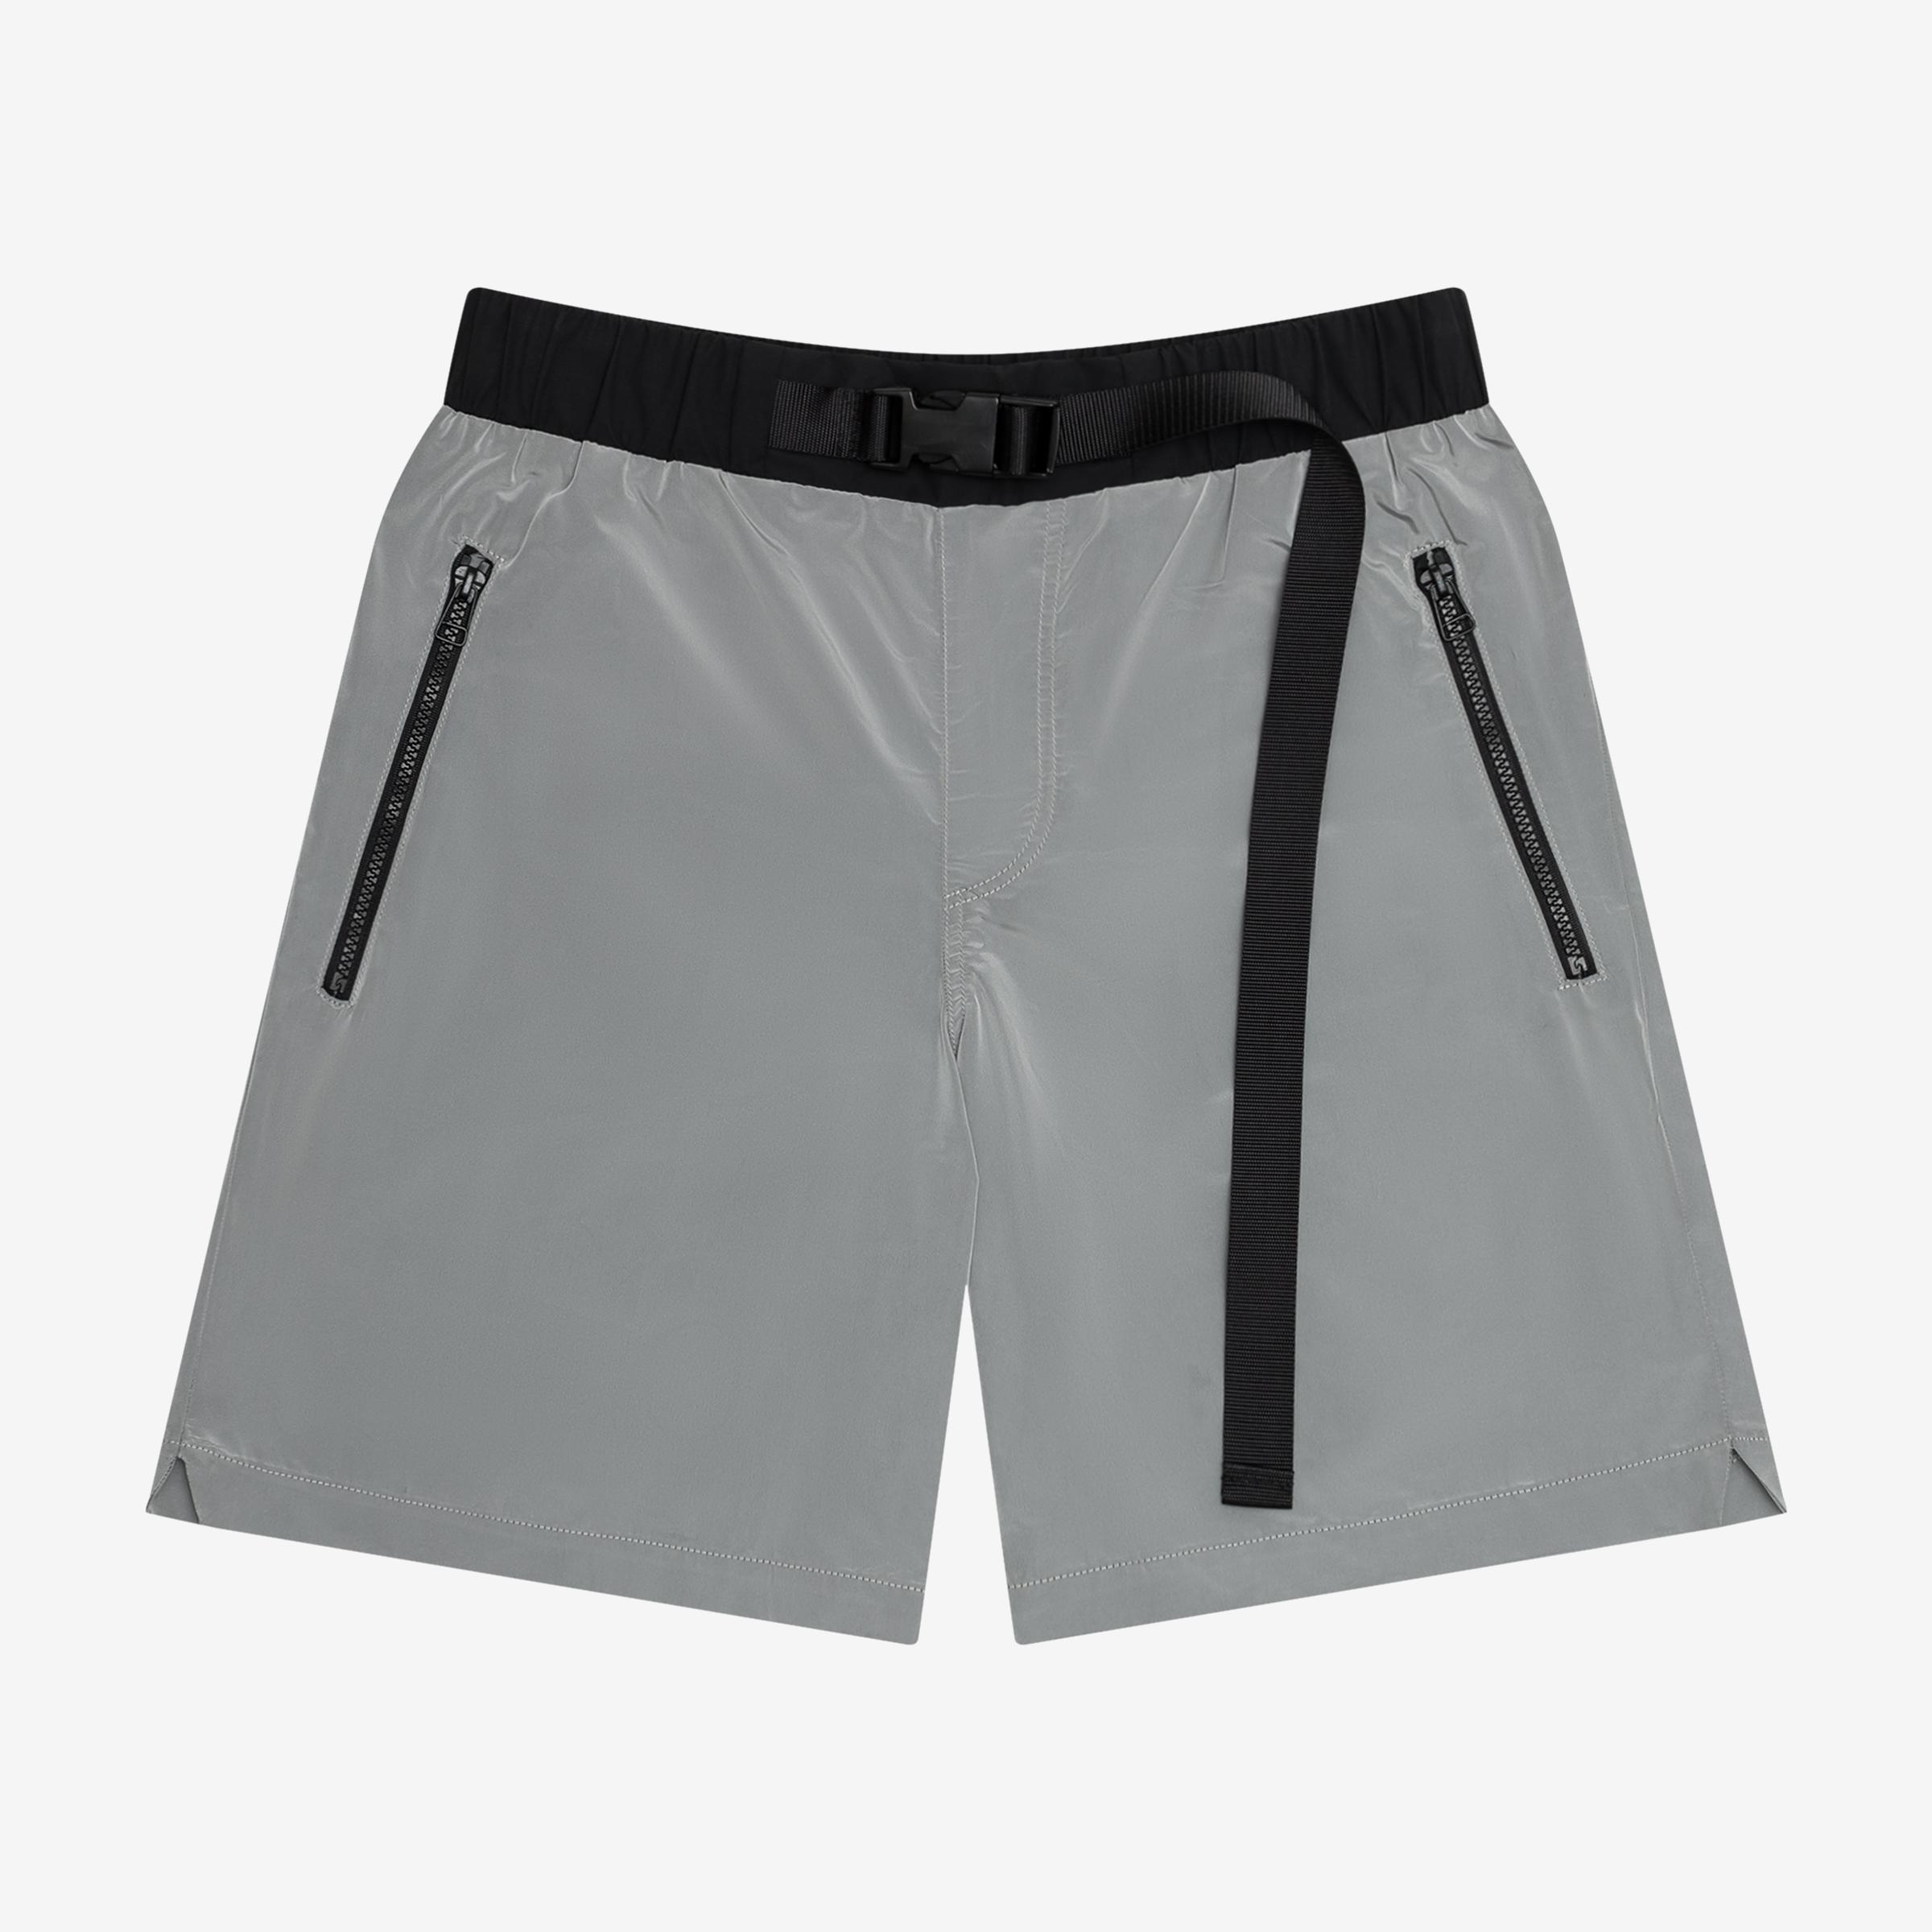 shorts product-photography